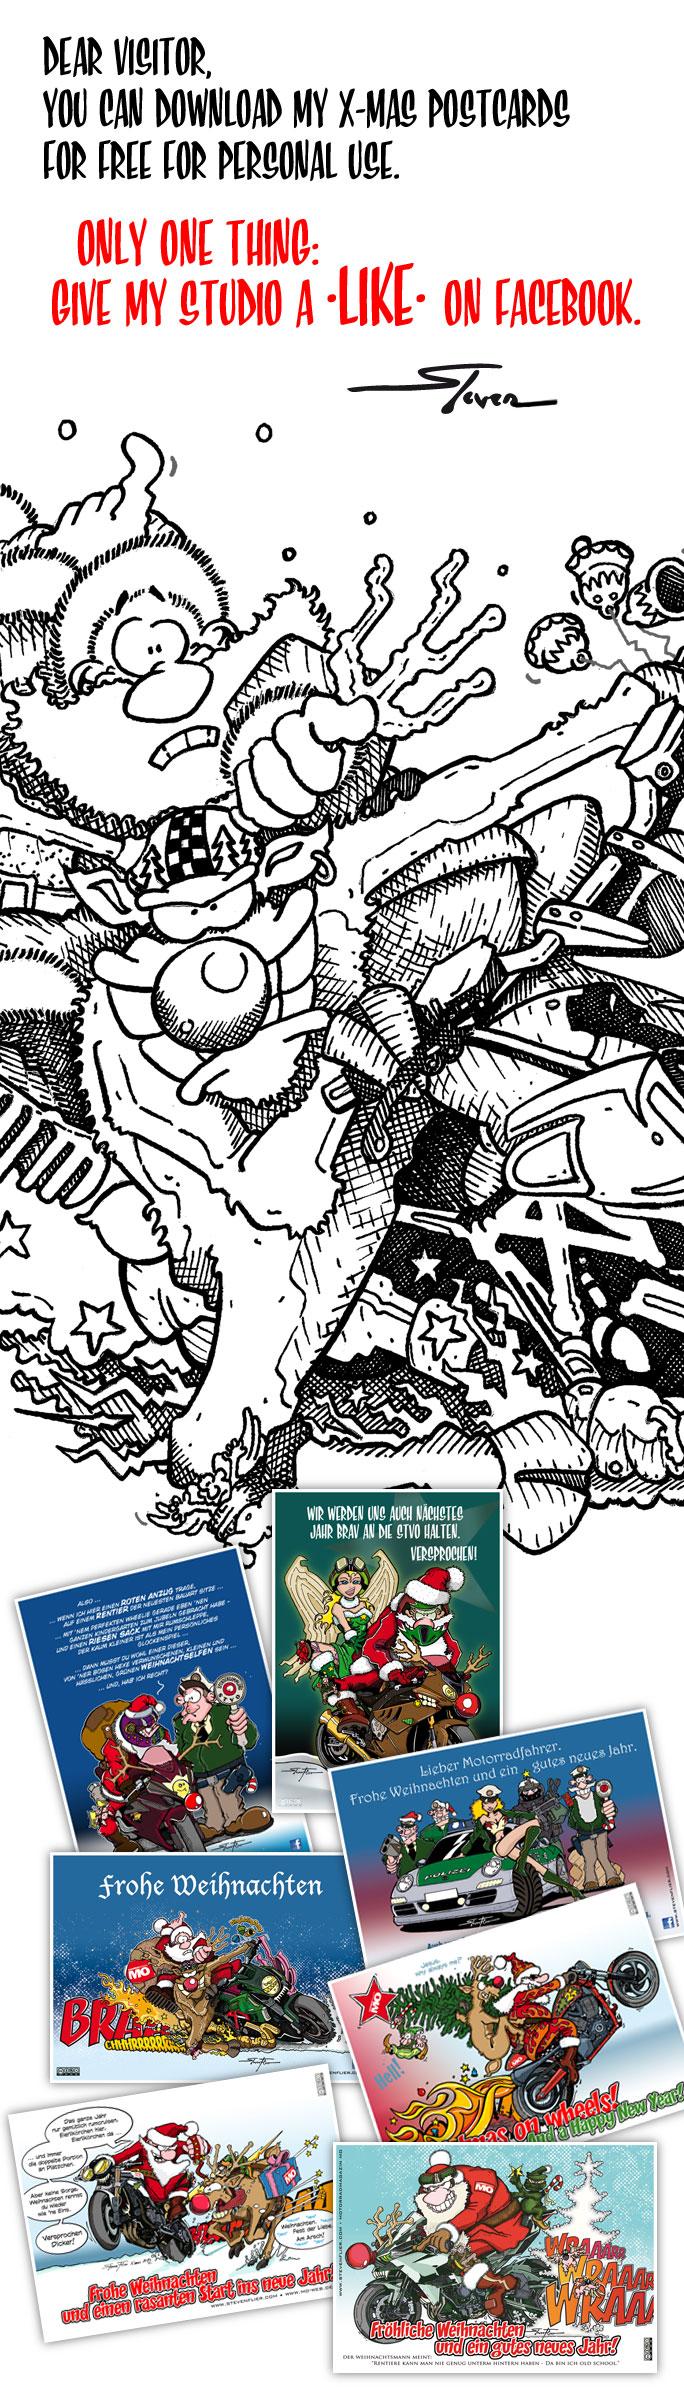 Weihnachten, Christmas, Illustration, Comic, Motorrad, Motorcycle, Santa Clause, Nikolaus, Steven Flier, Motorrad Magazin MO, Postcards, Free Download